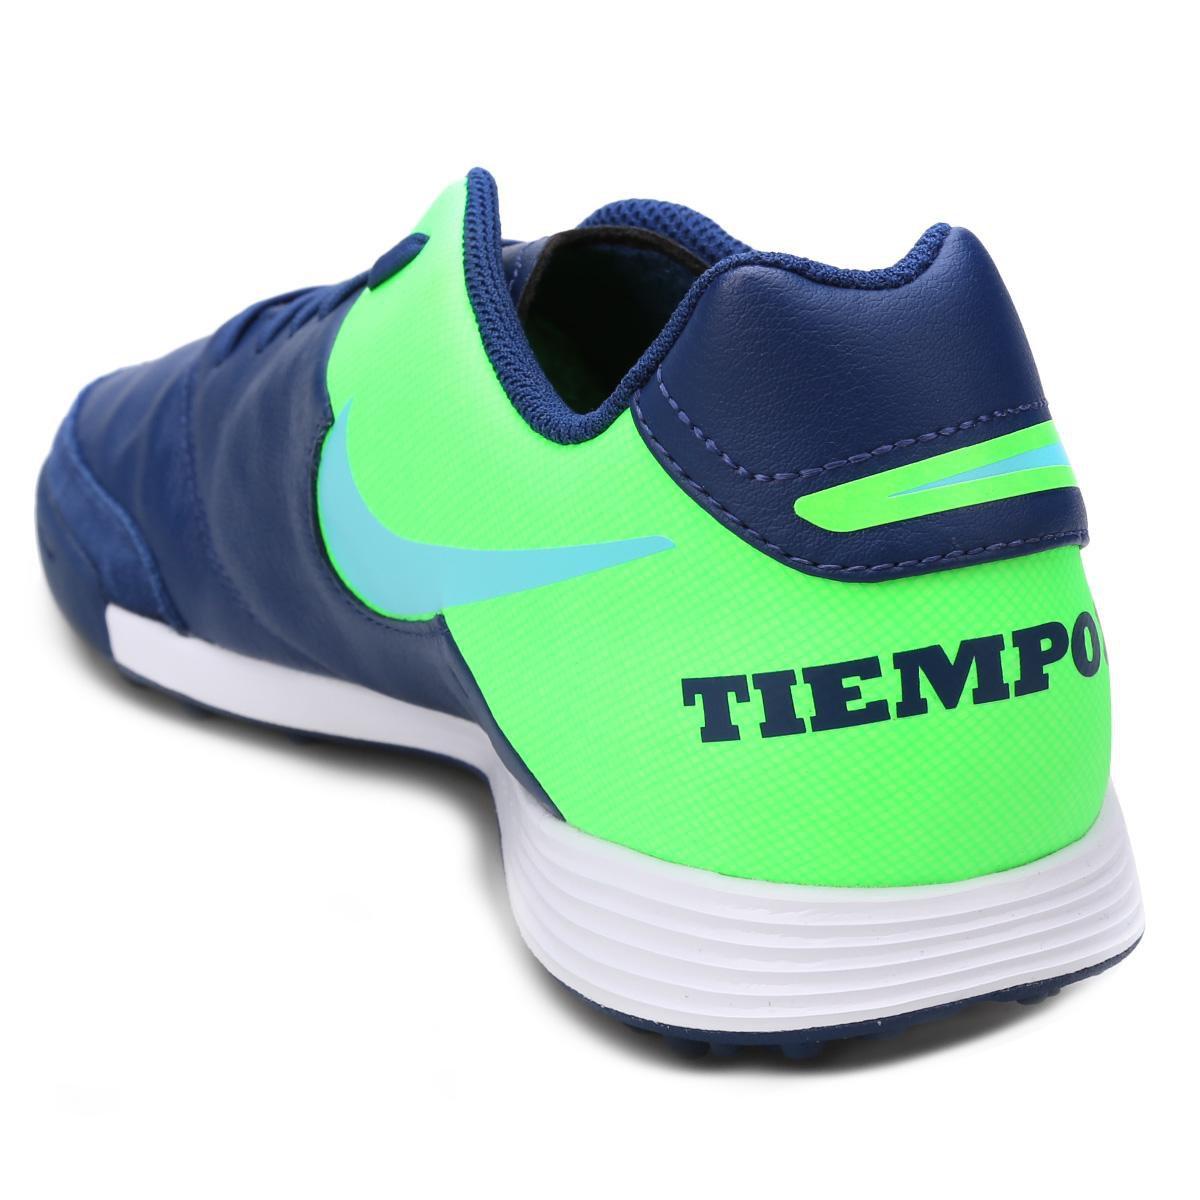 0fe6f2164e Chuteira Society Nike Tiempo Genio 2 Leather TF - Azul e Verde ...